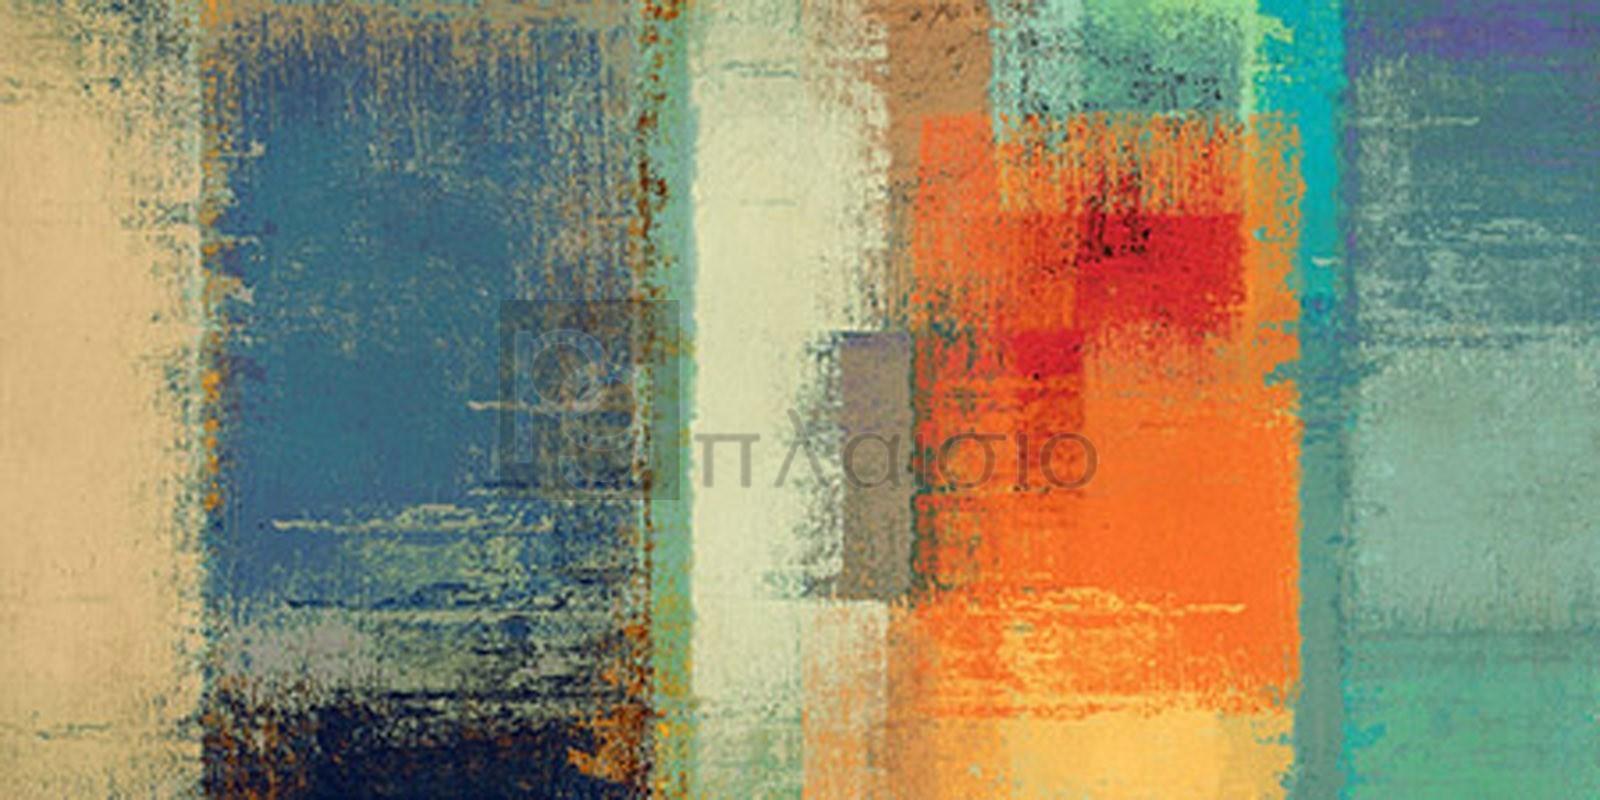 Ruggero Falcone - Different Type of Rainbow